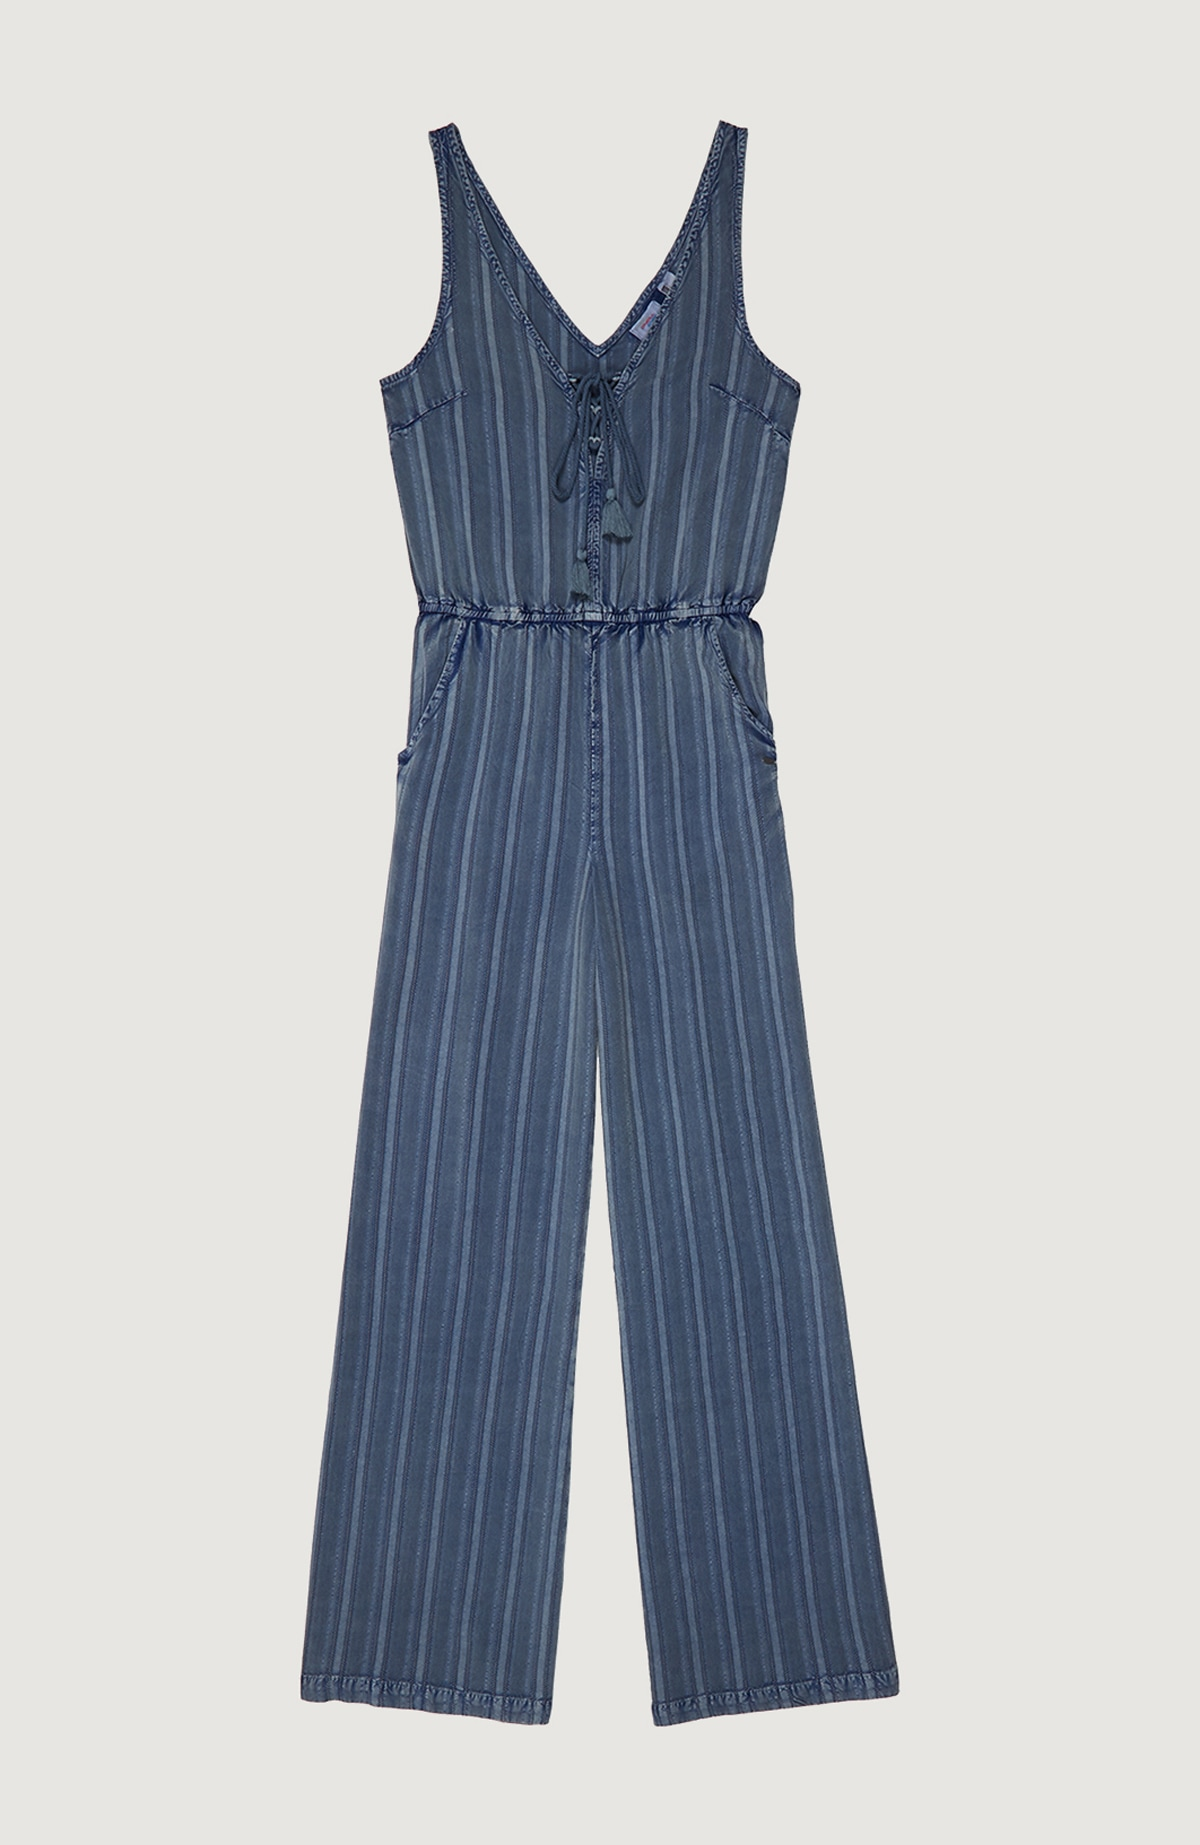 oneill jumpsuits - VIA APPIA DUE Feminine Strick-Jacke mit Taschen , Via Appia Due